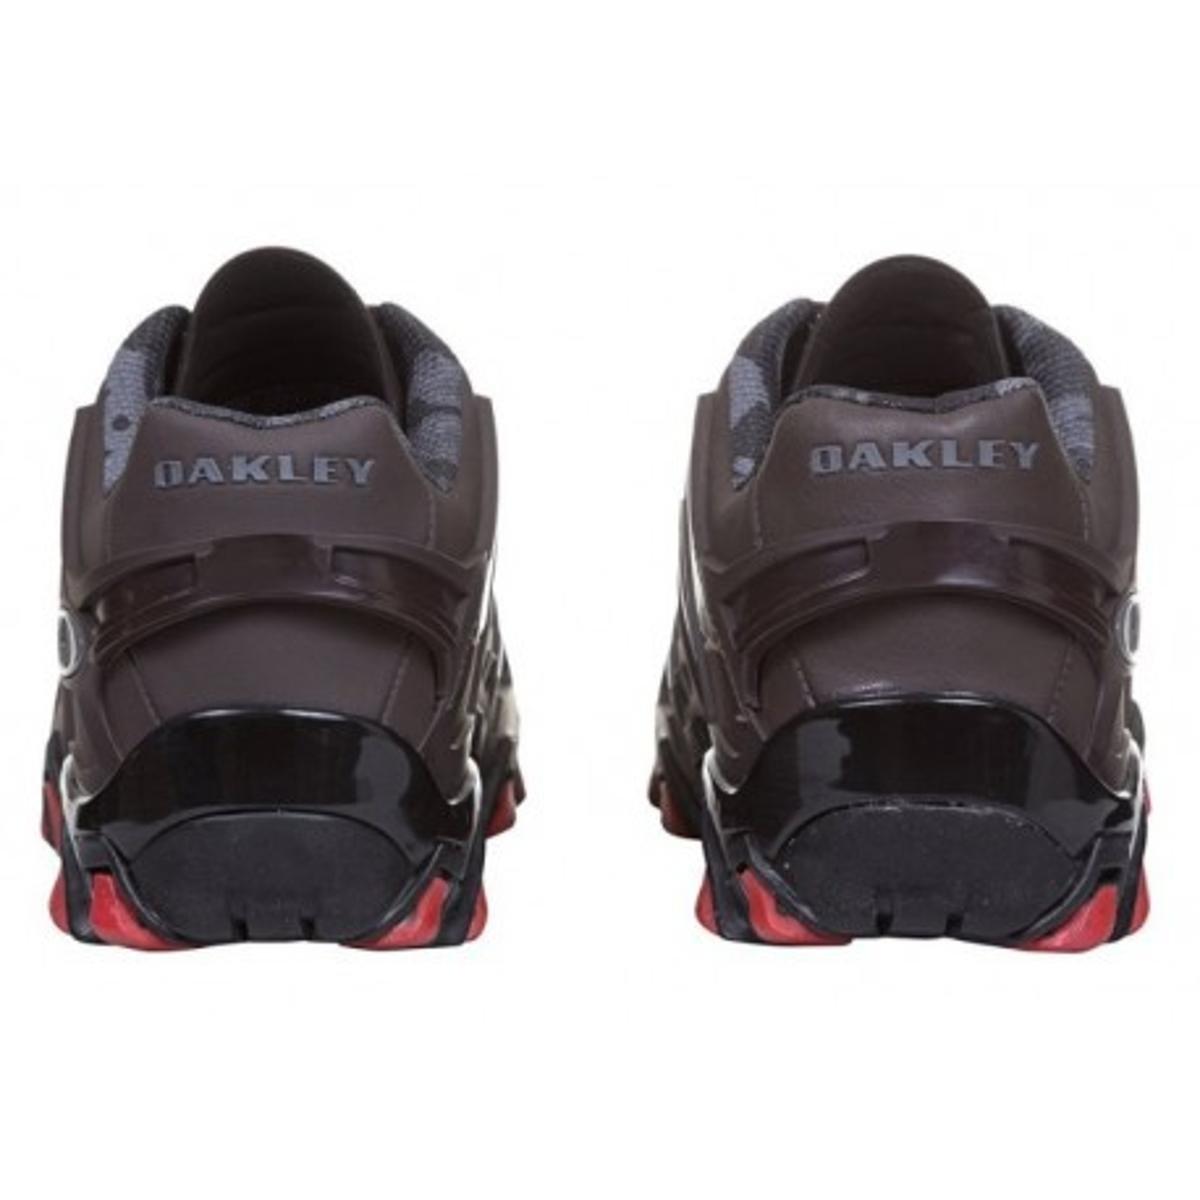 Oakley Oakley Tênis Marrom Hardshell Hardshell Tênis Marrom gpI6wvqIx